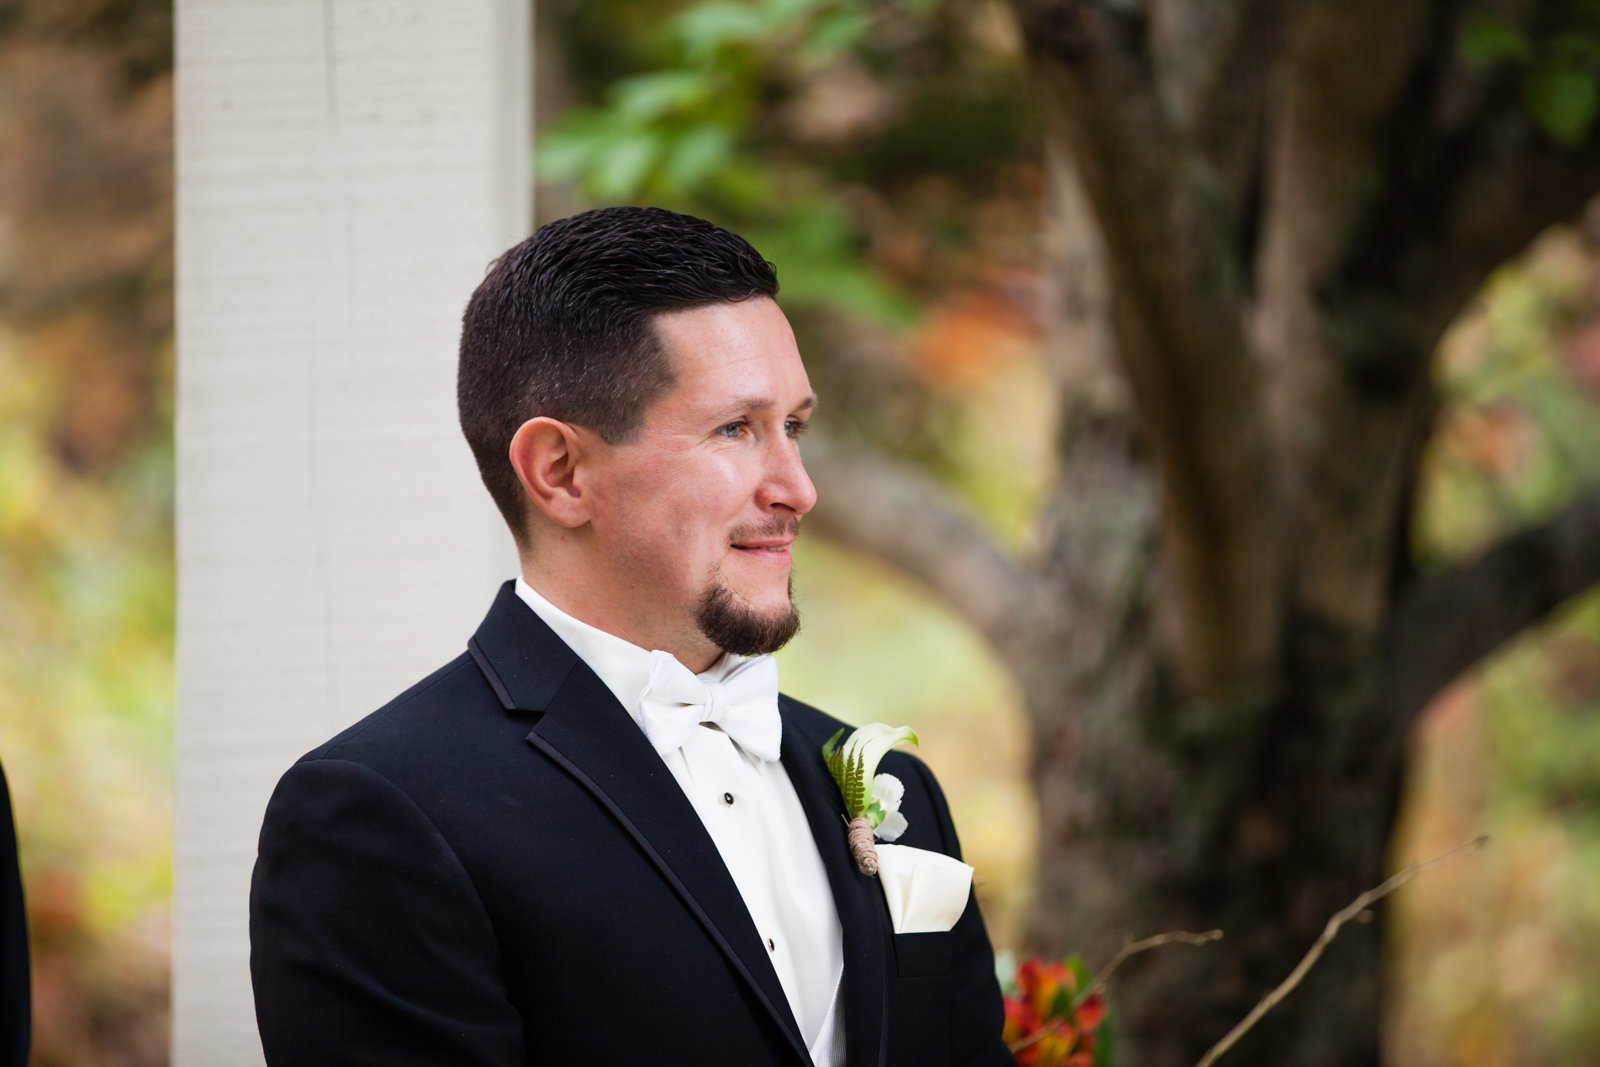 Glimmerstone-Mansion-Vermont-Wedding-Photography-Amanda-Morgan-45.jpg